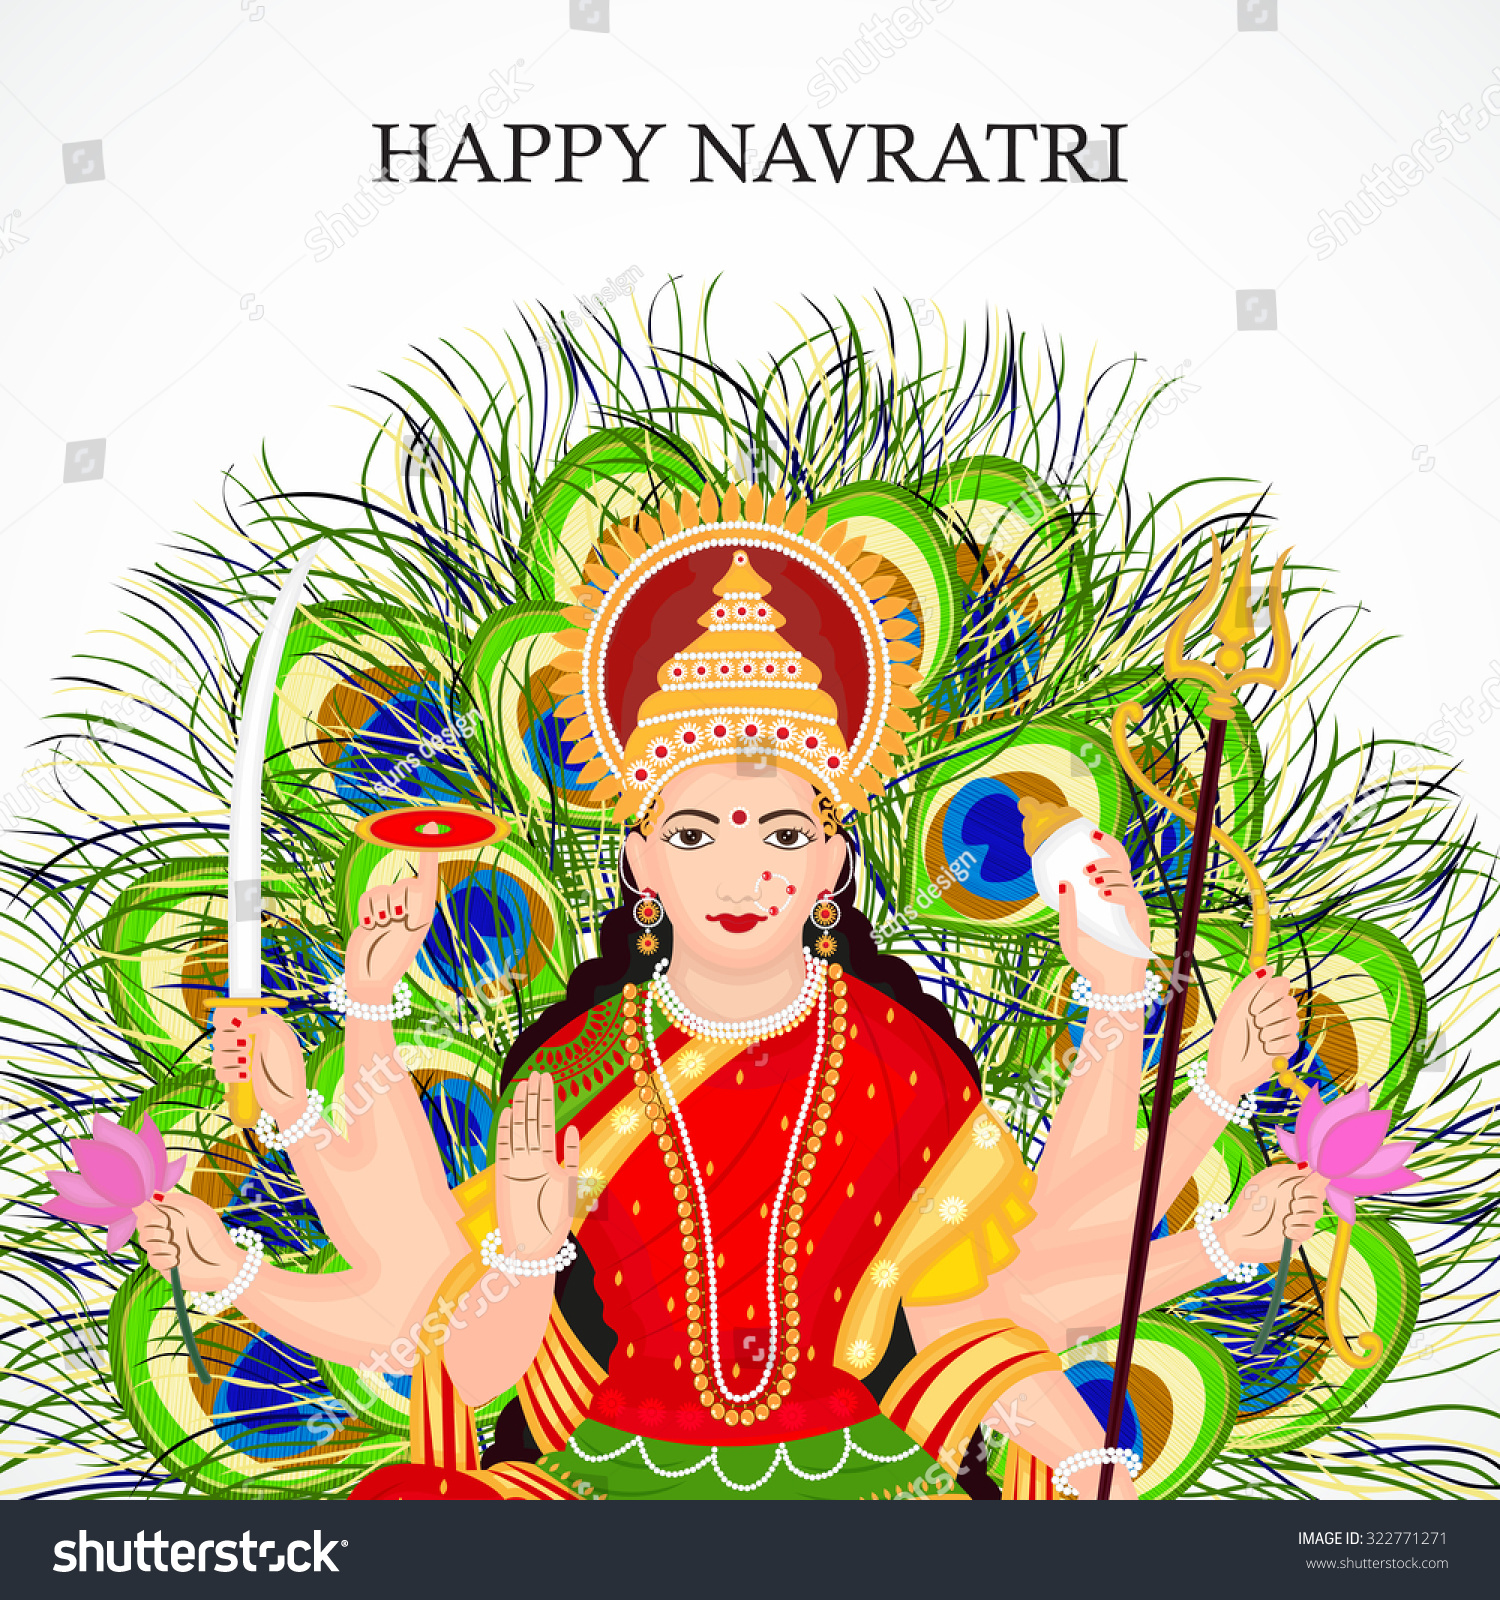 vector illustration happy navratri dandiya festival stock